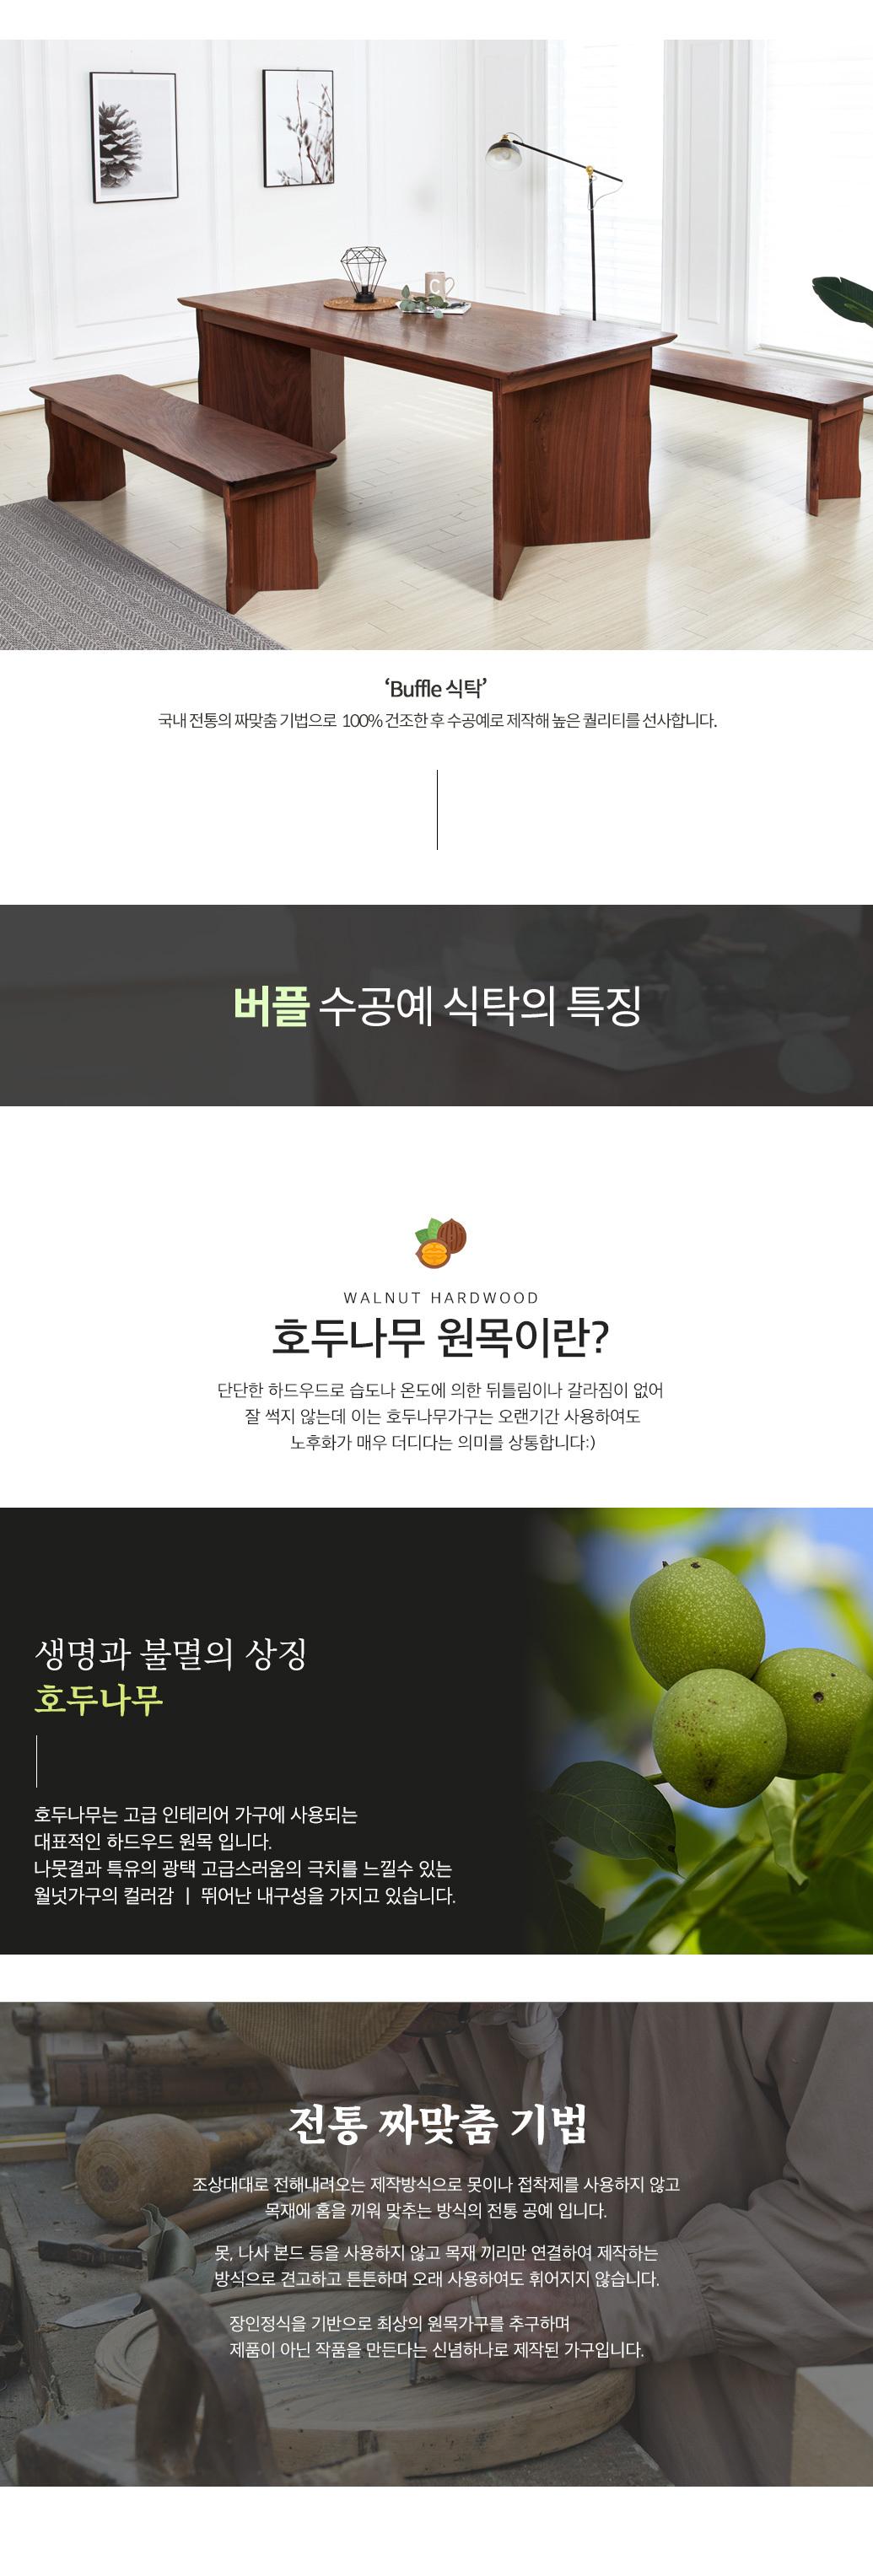 Buffle_table_02.jpg